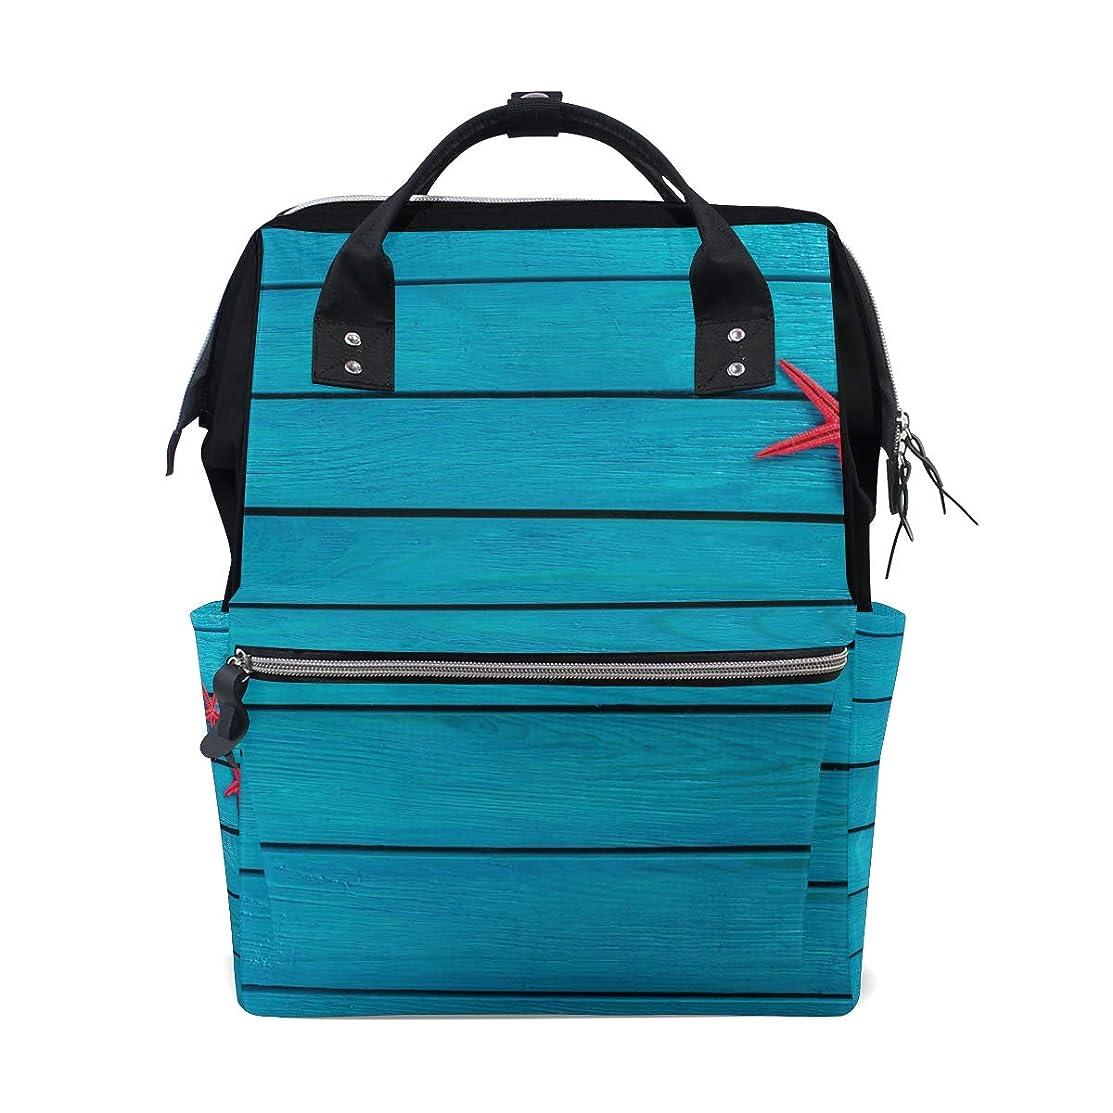 Blue Wood Board Starfishes School Backpack Large Capacity Mummy Bags Laptop Handbag Casual Travel Rucksack Satchel For Women Men Adult Teen Children